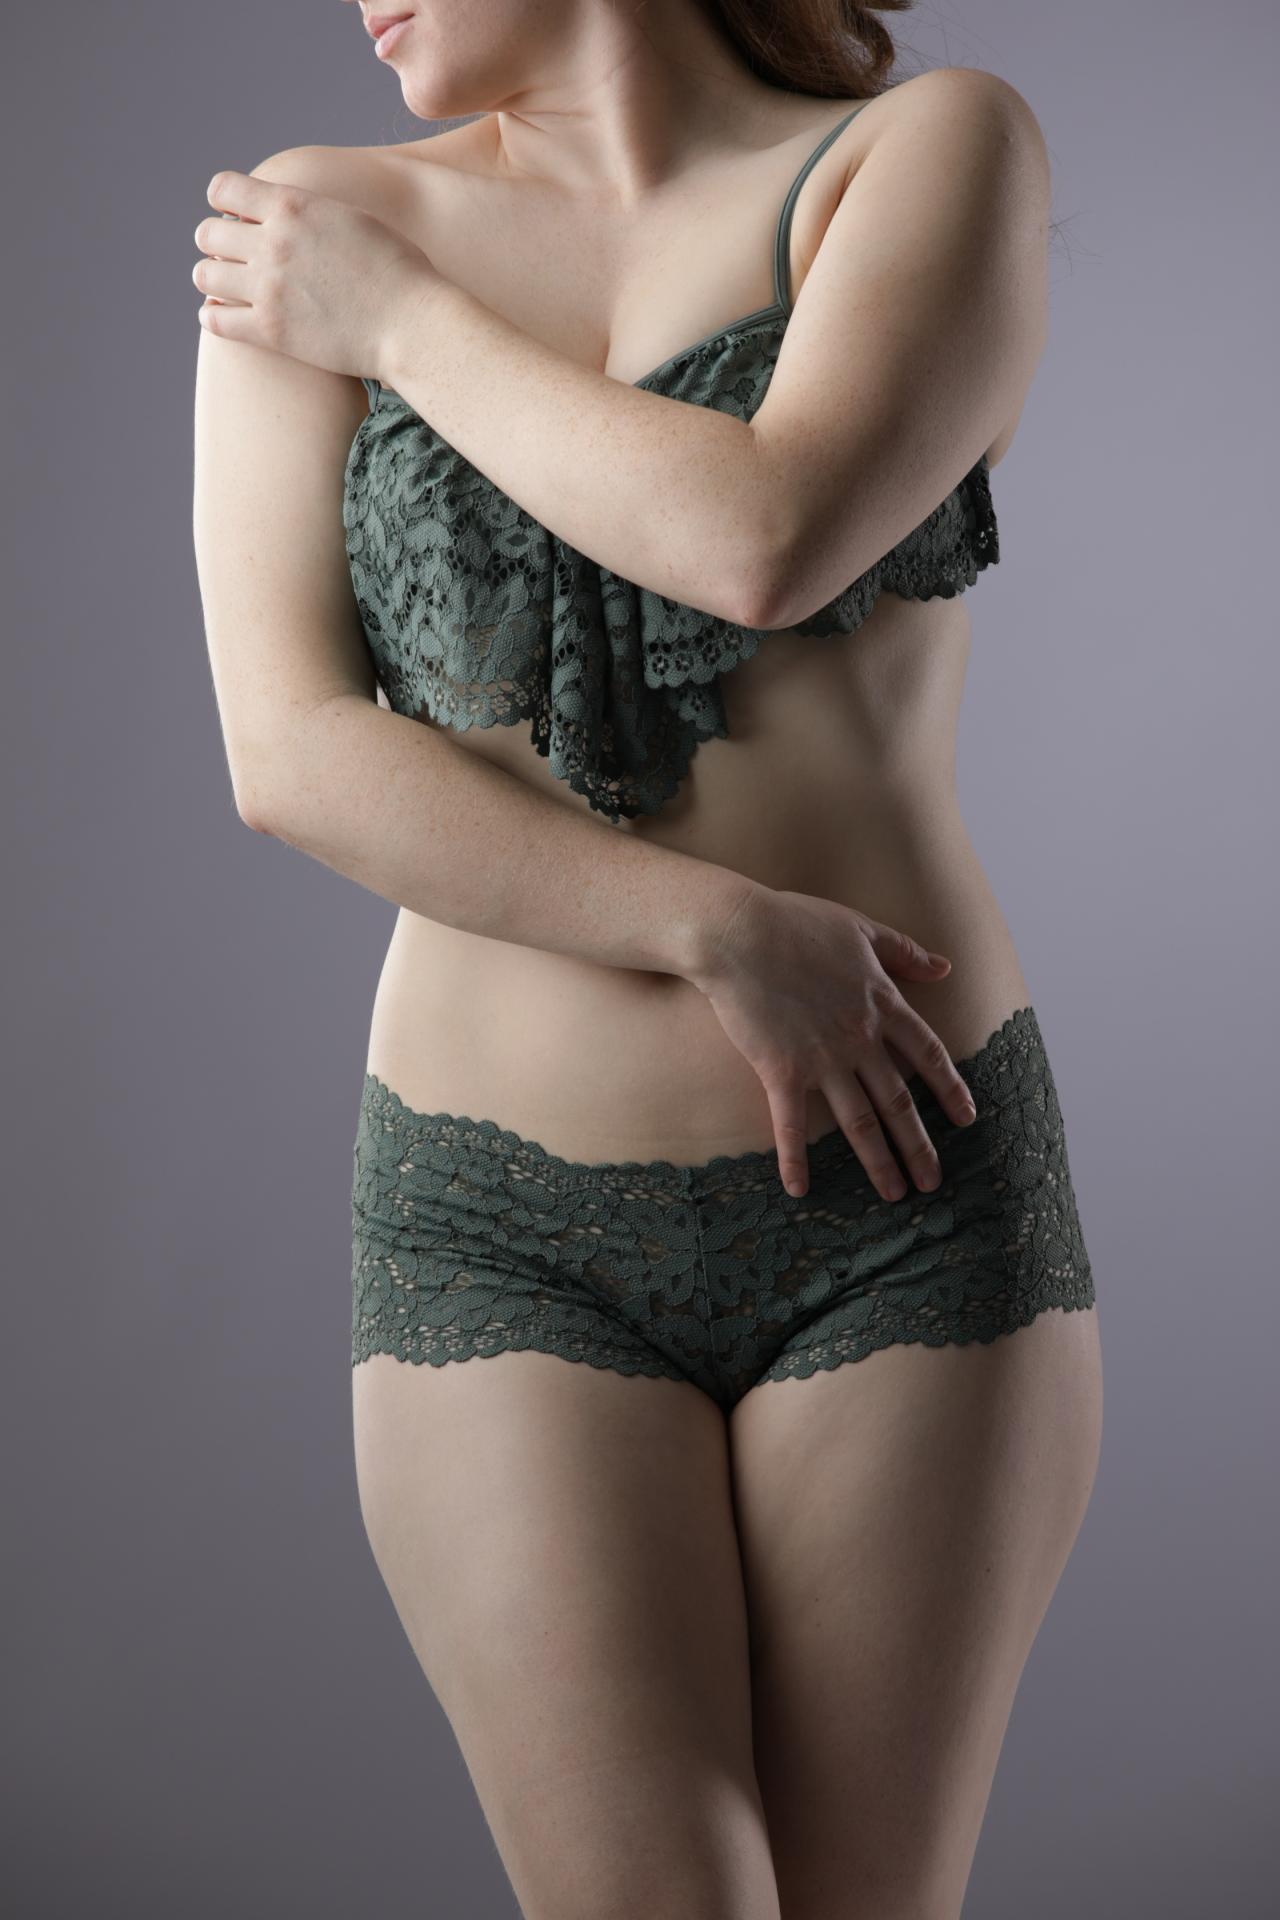 Seattle escort, escort, erotic massage, fbsm, seattle companion